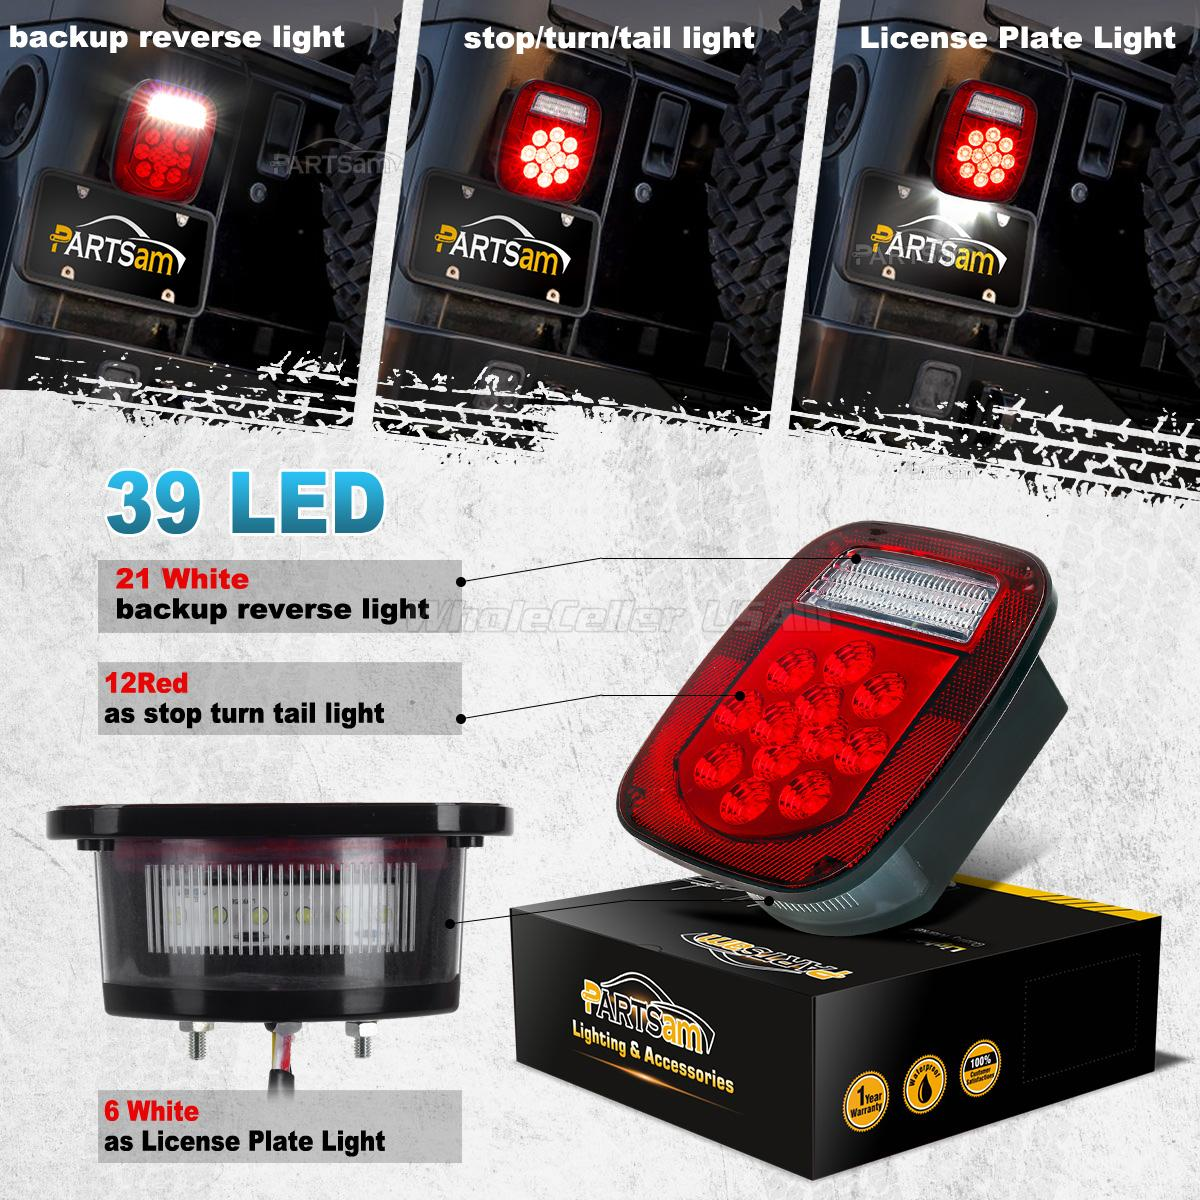 Backup Light Wiring On Jeep Tj Led Tail Lights And Schematics Wrangler Reverse 39 Truck Trailer Boat Cj Yj Jk Stop Turn